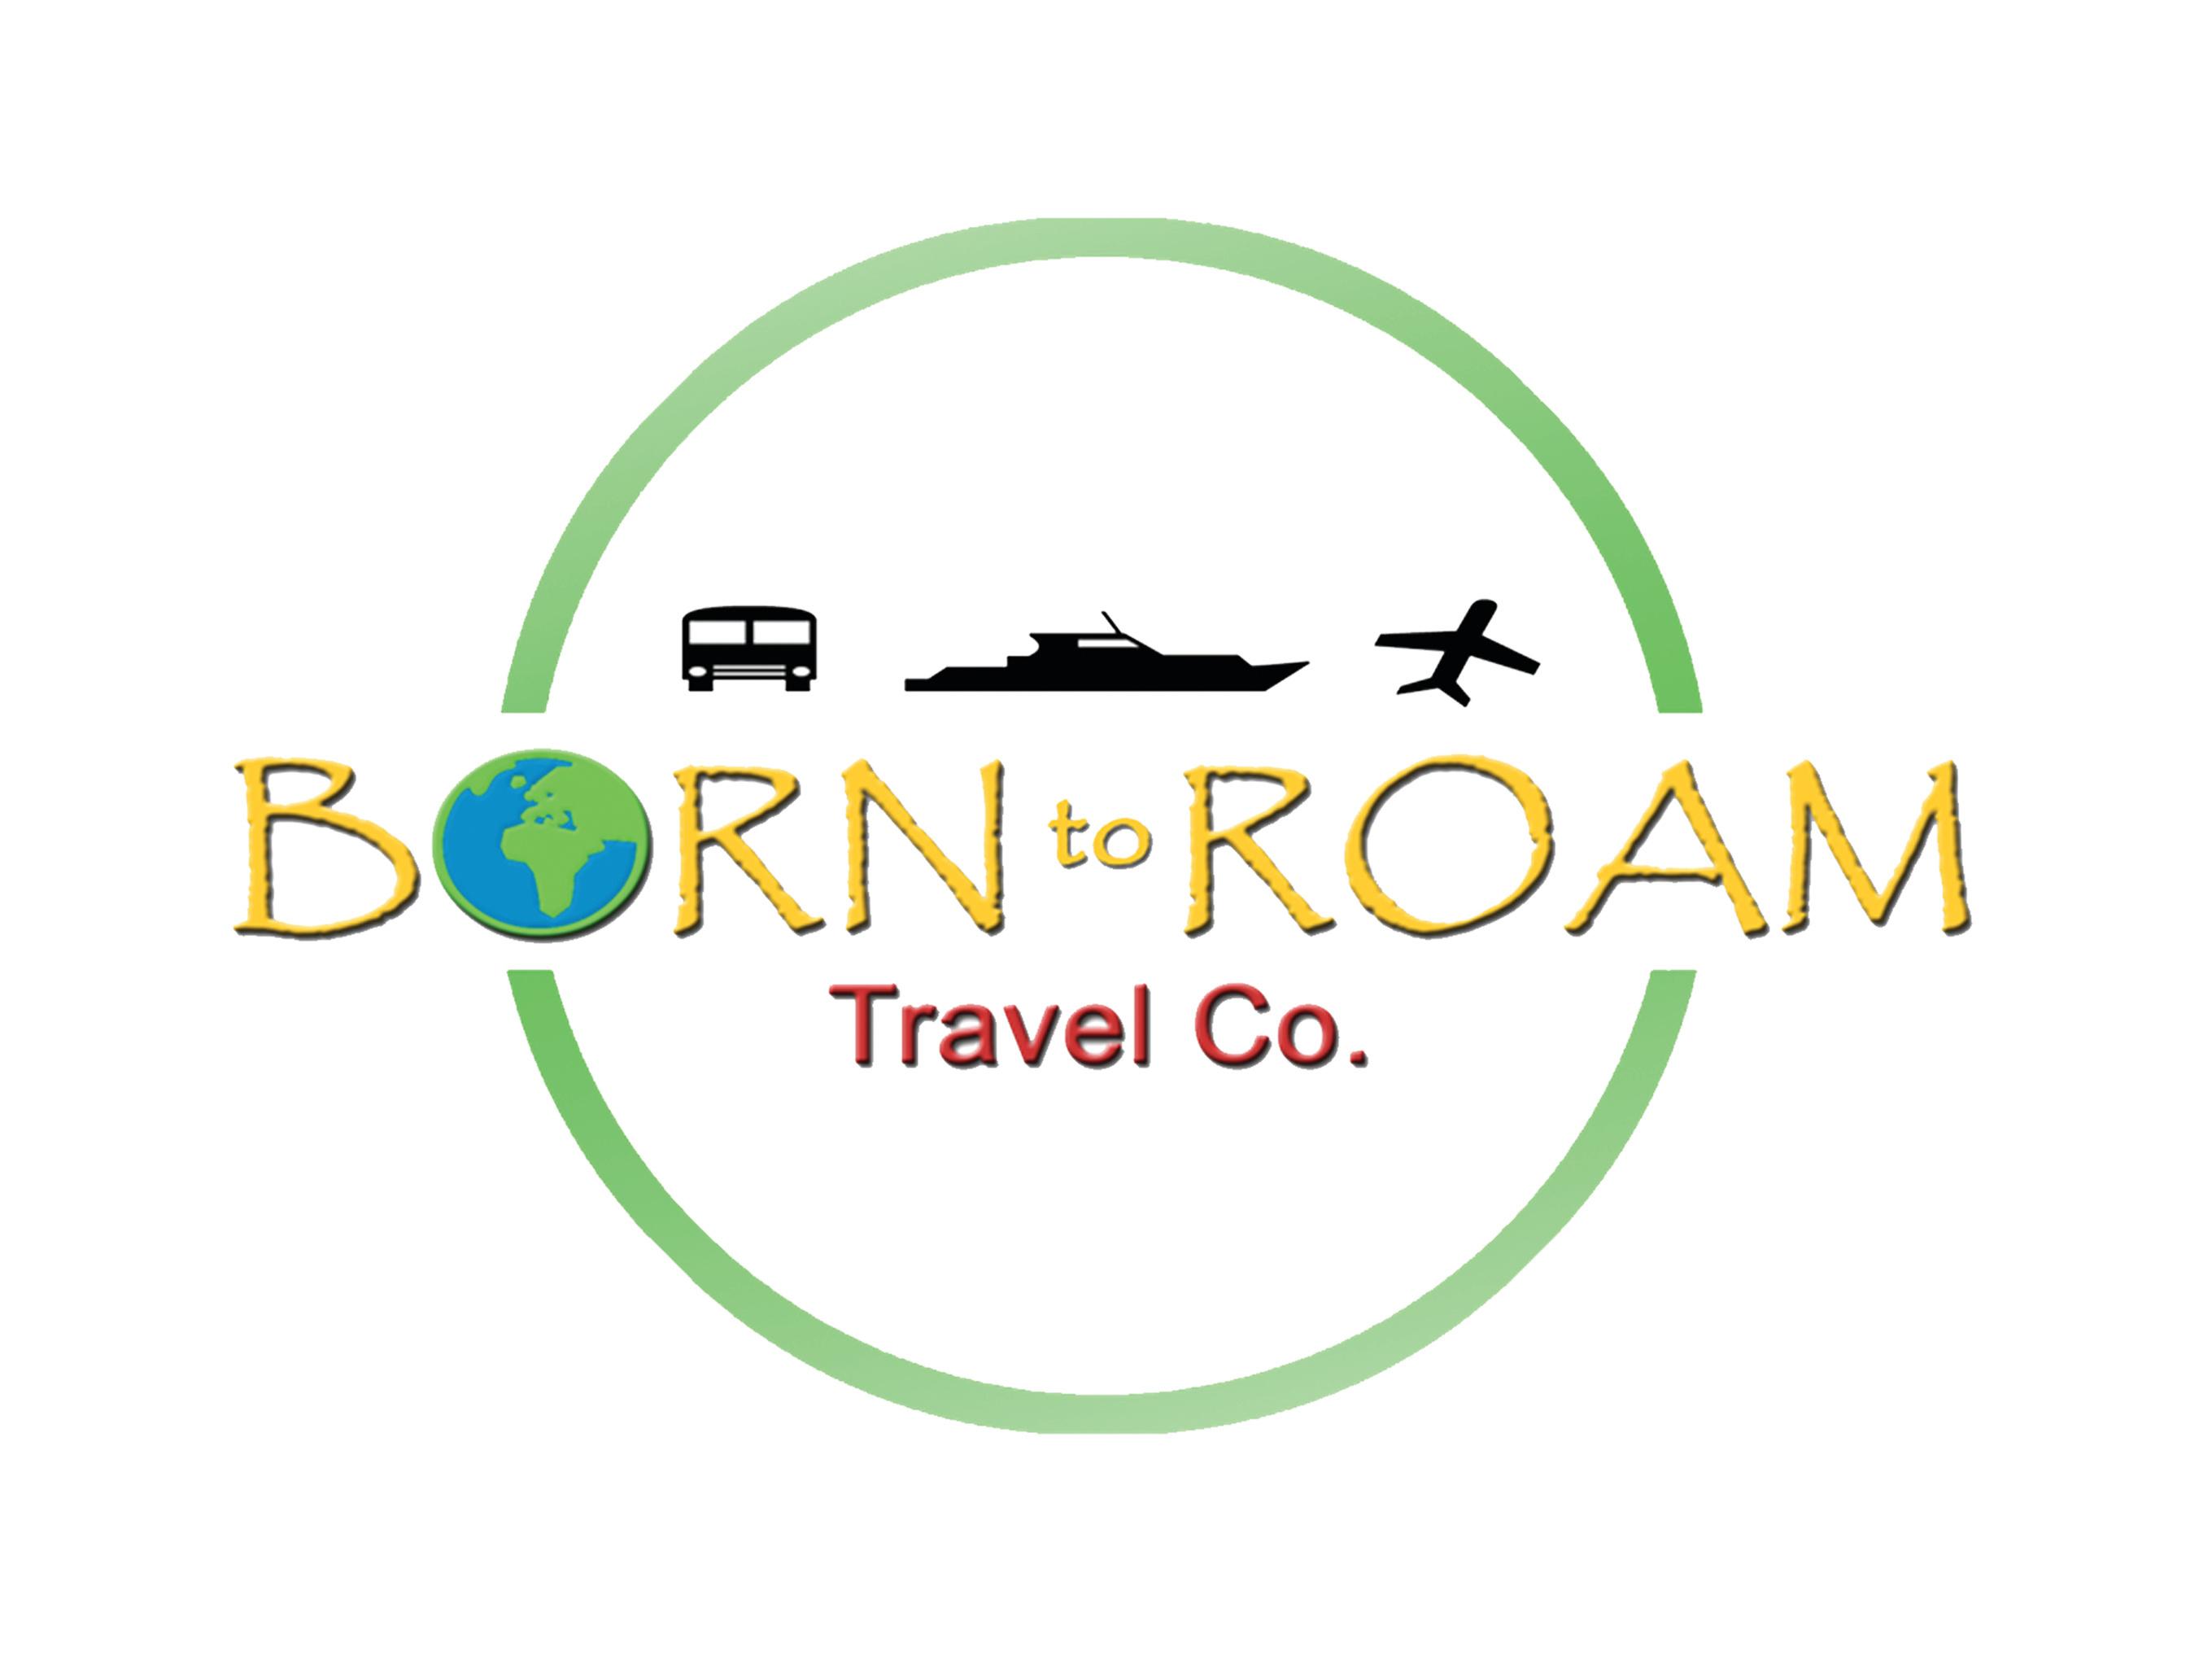 07. BORN TO ROAM TRAVEL CO.